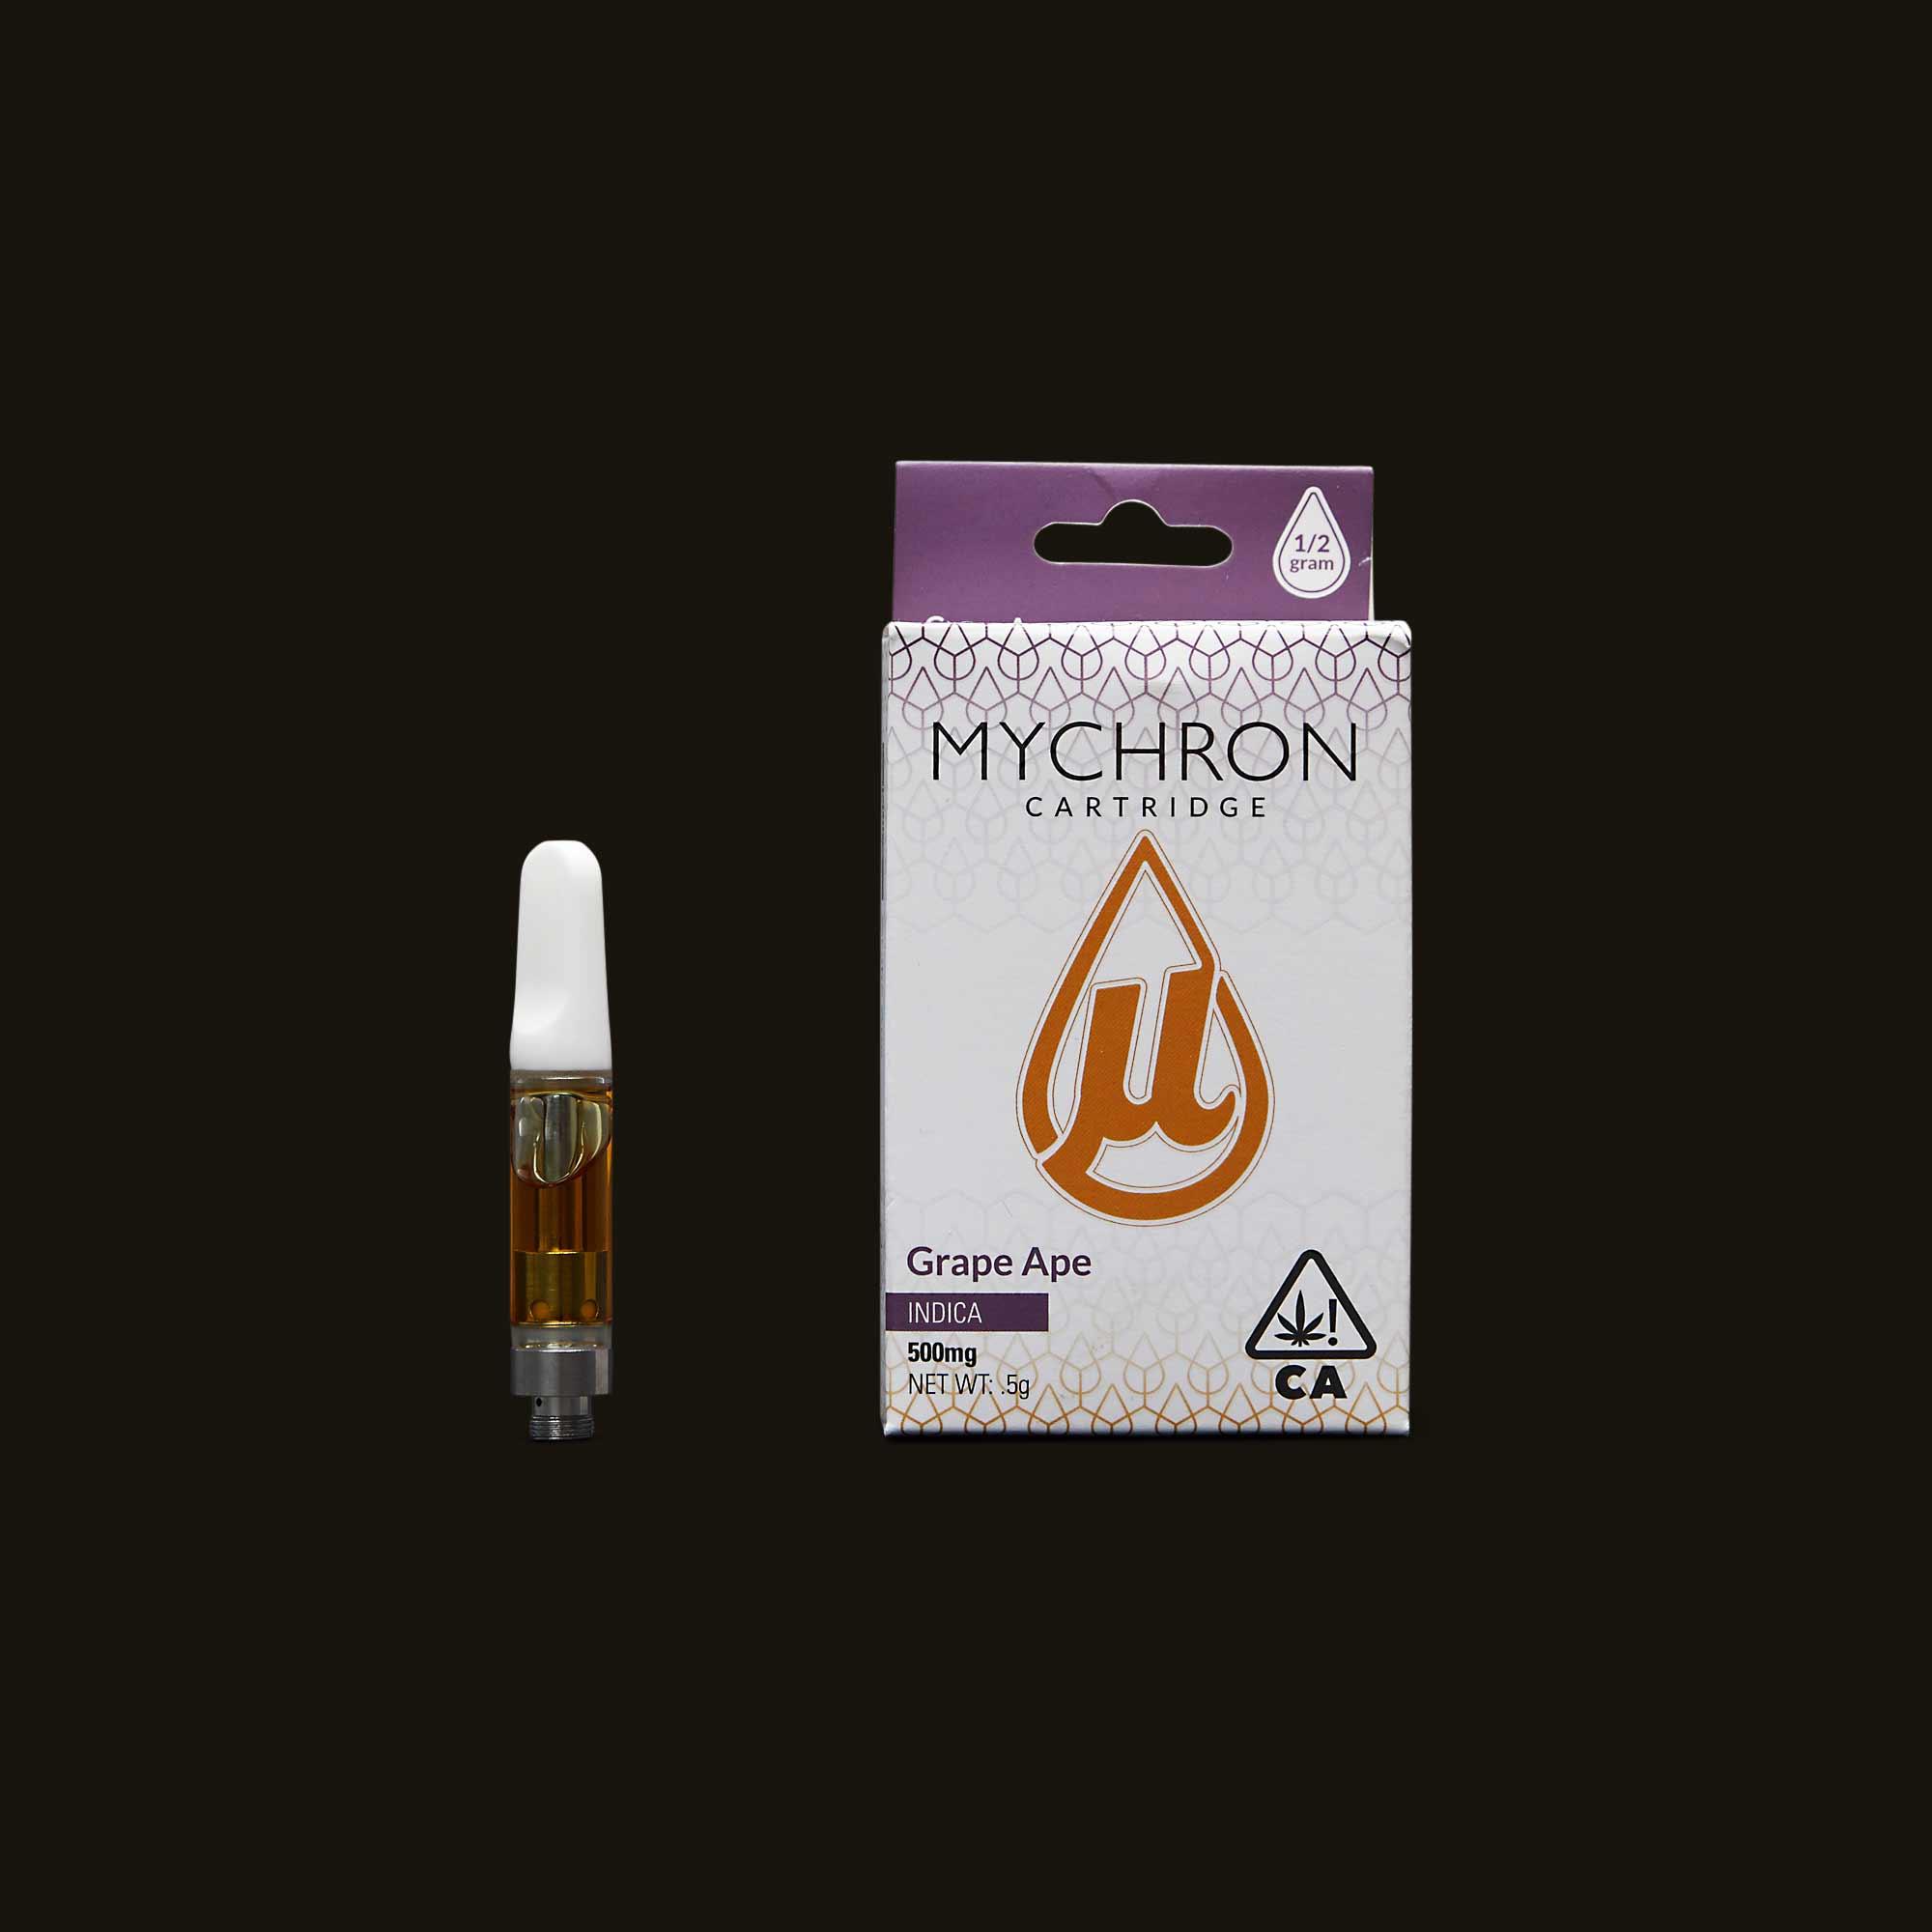 Mychron Grape Ape Cartridge